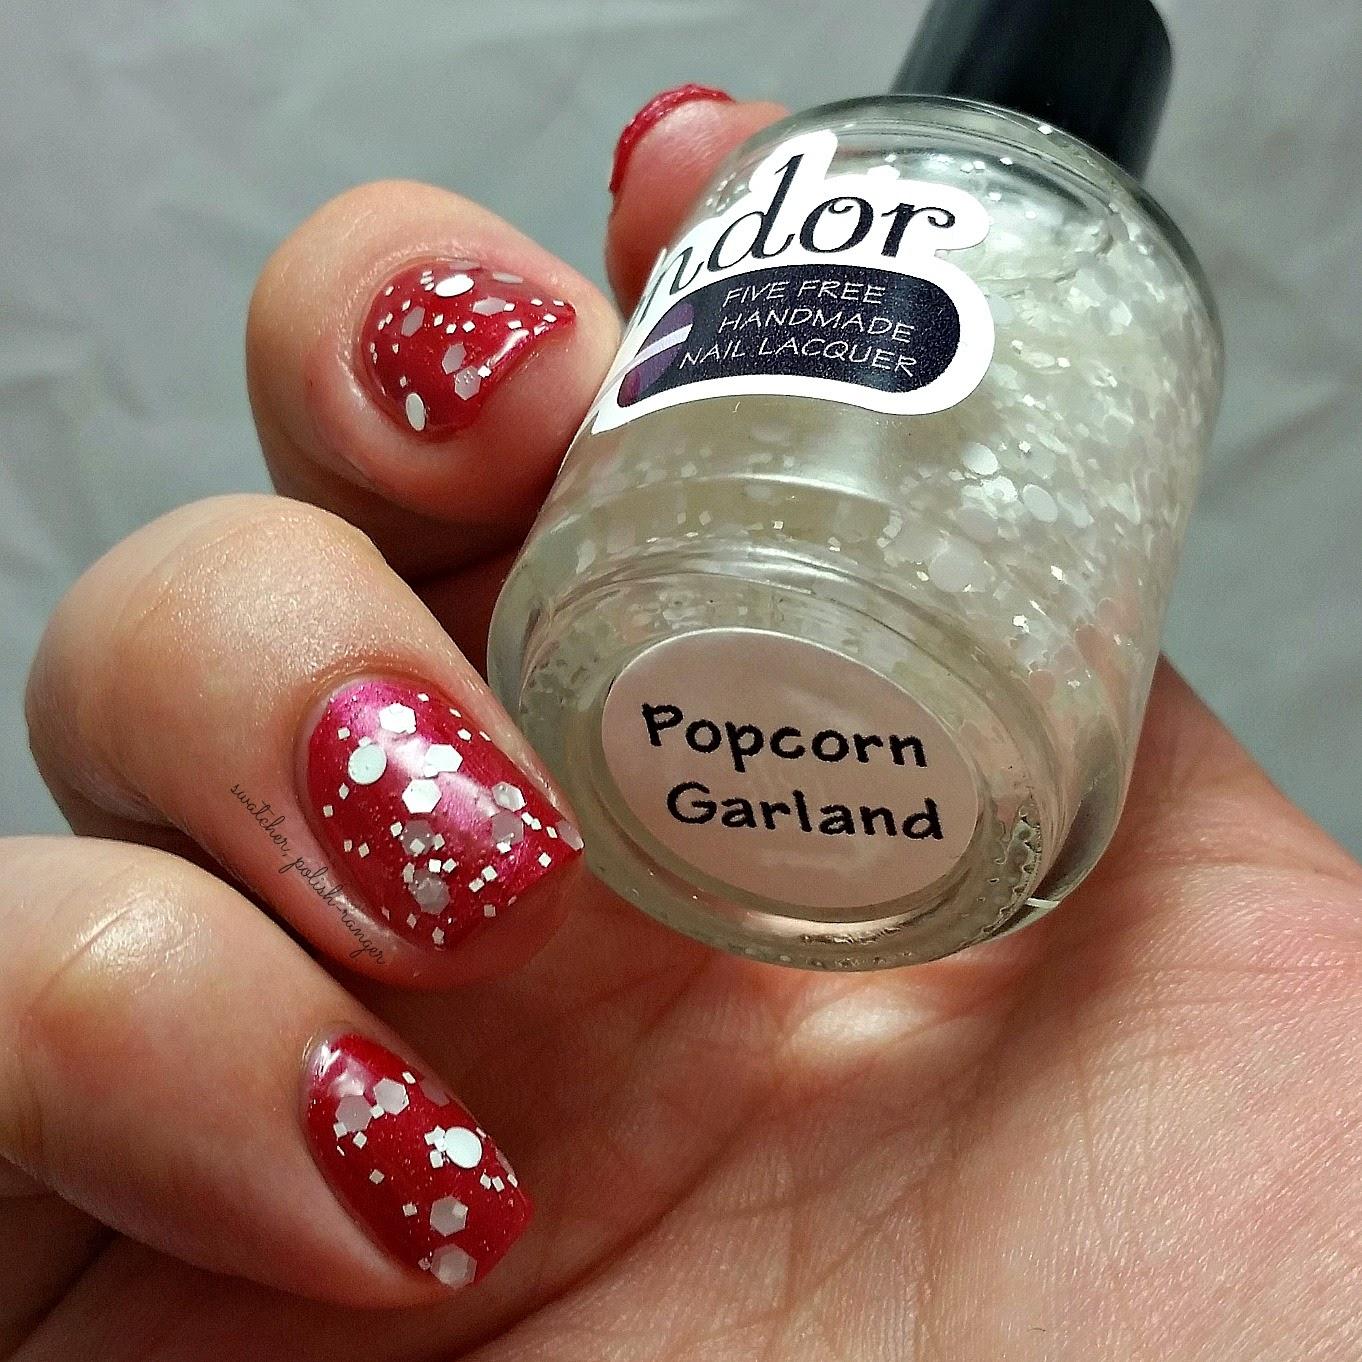 swatcher, polish-ranger | Splendor Nail Lacquer Popcorn Garland swatch (over Bing)